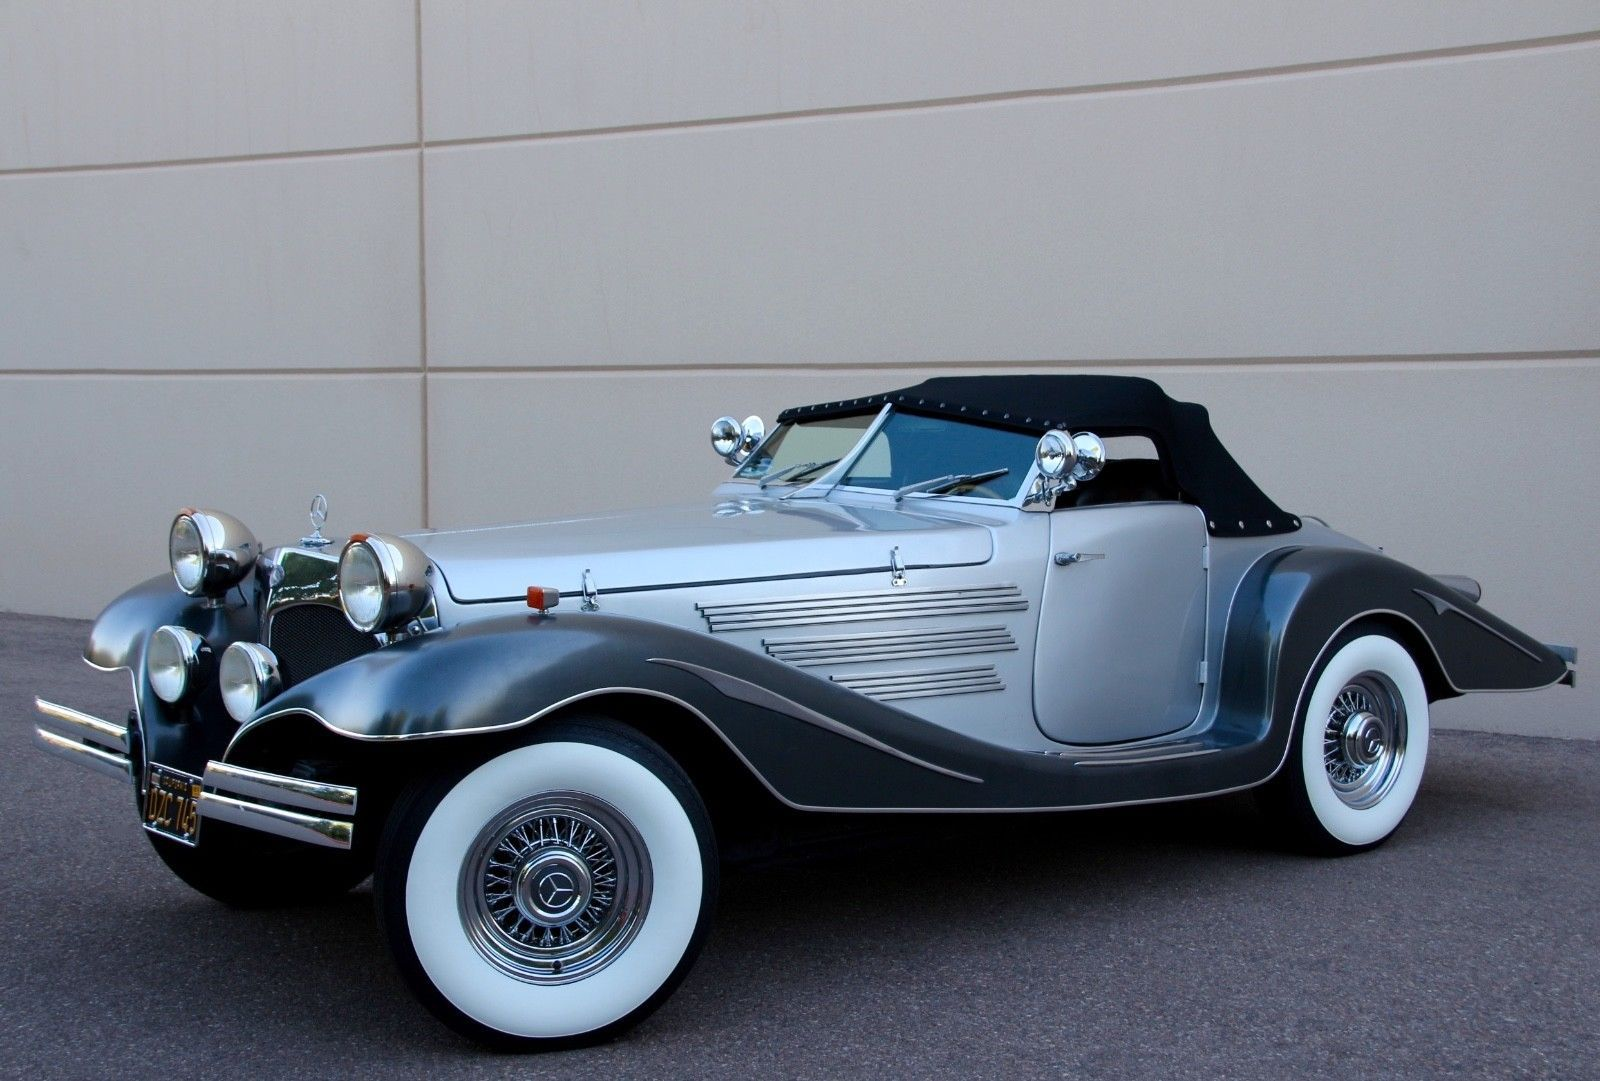 Old School 1934 Mercedes Benz 500k 540k Replica Replica Cars For